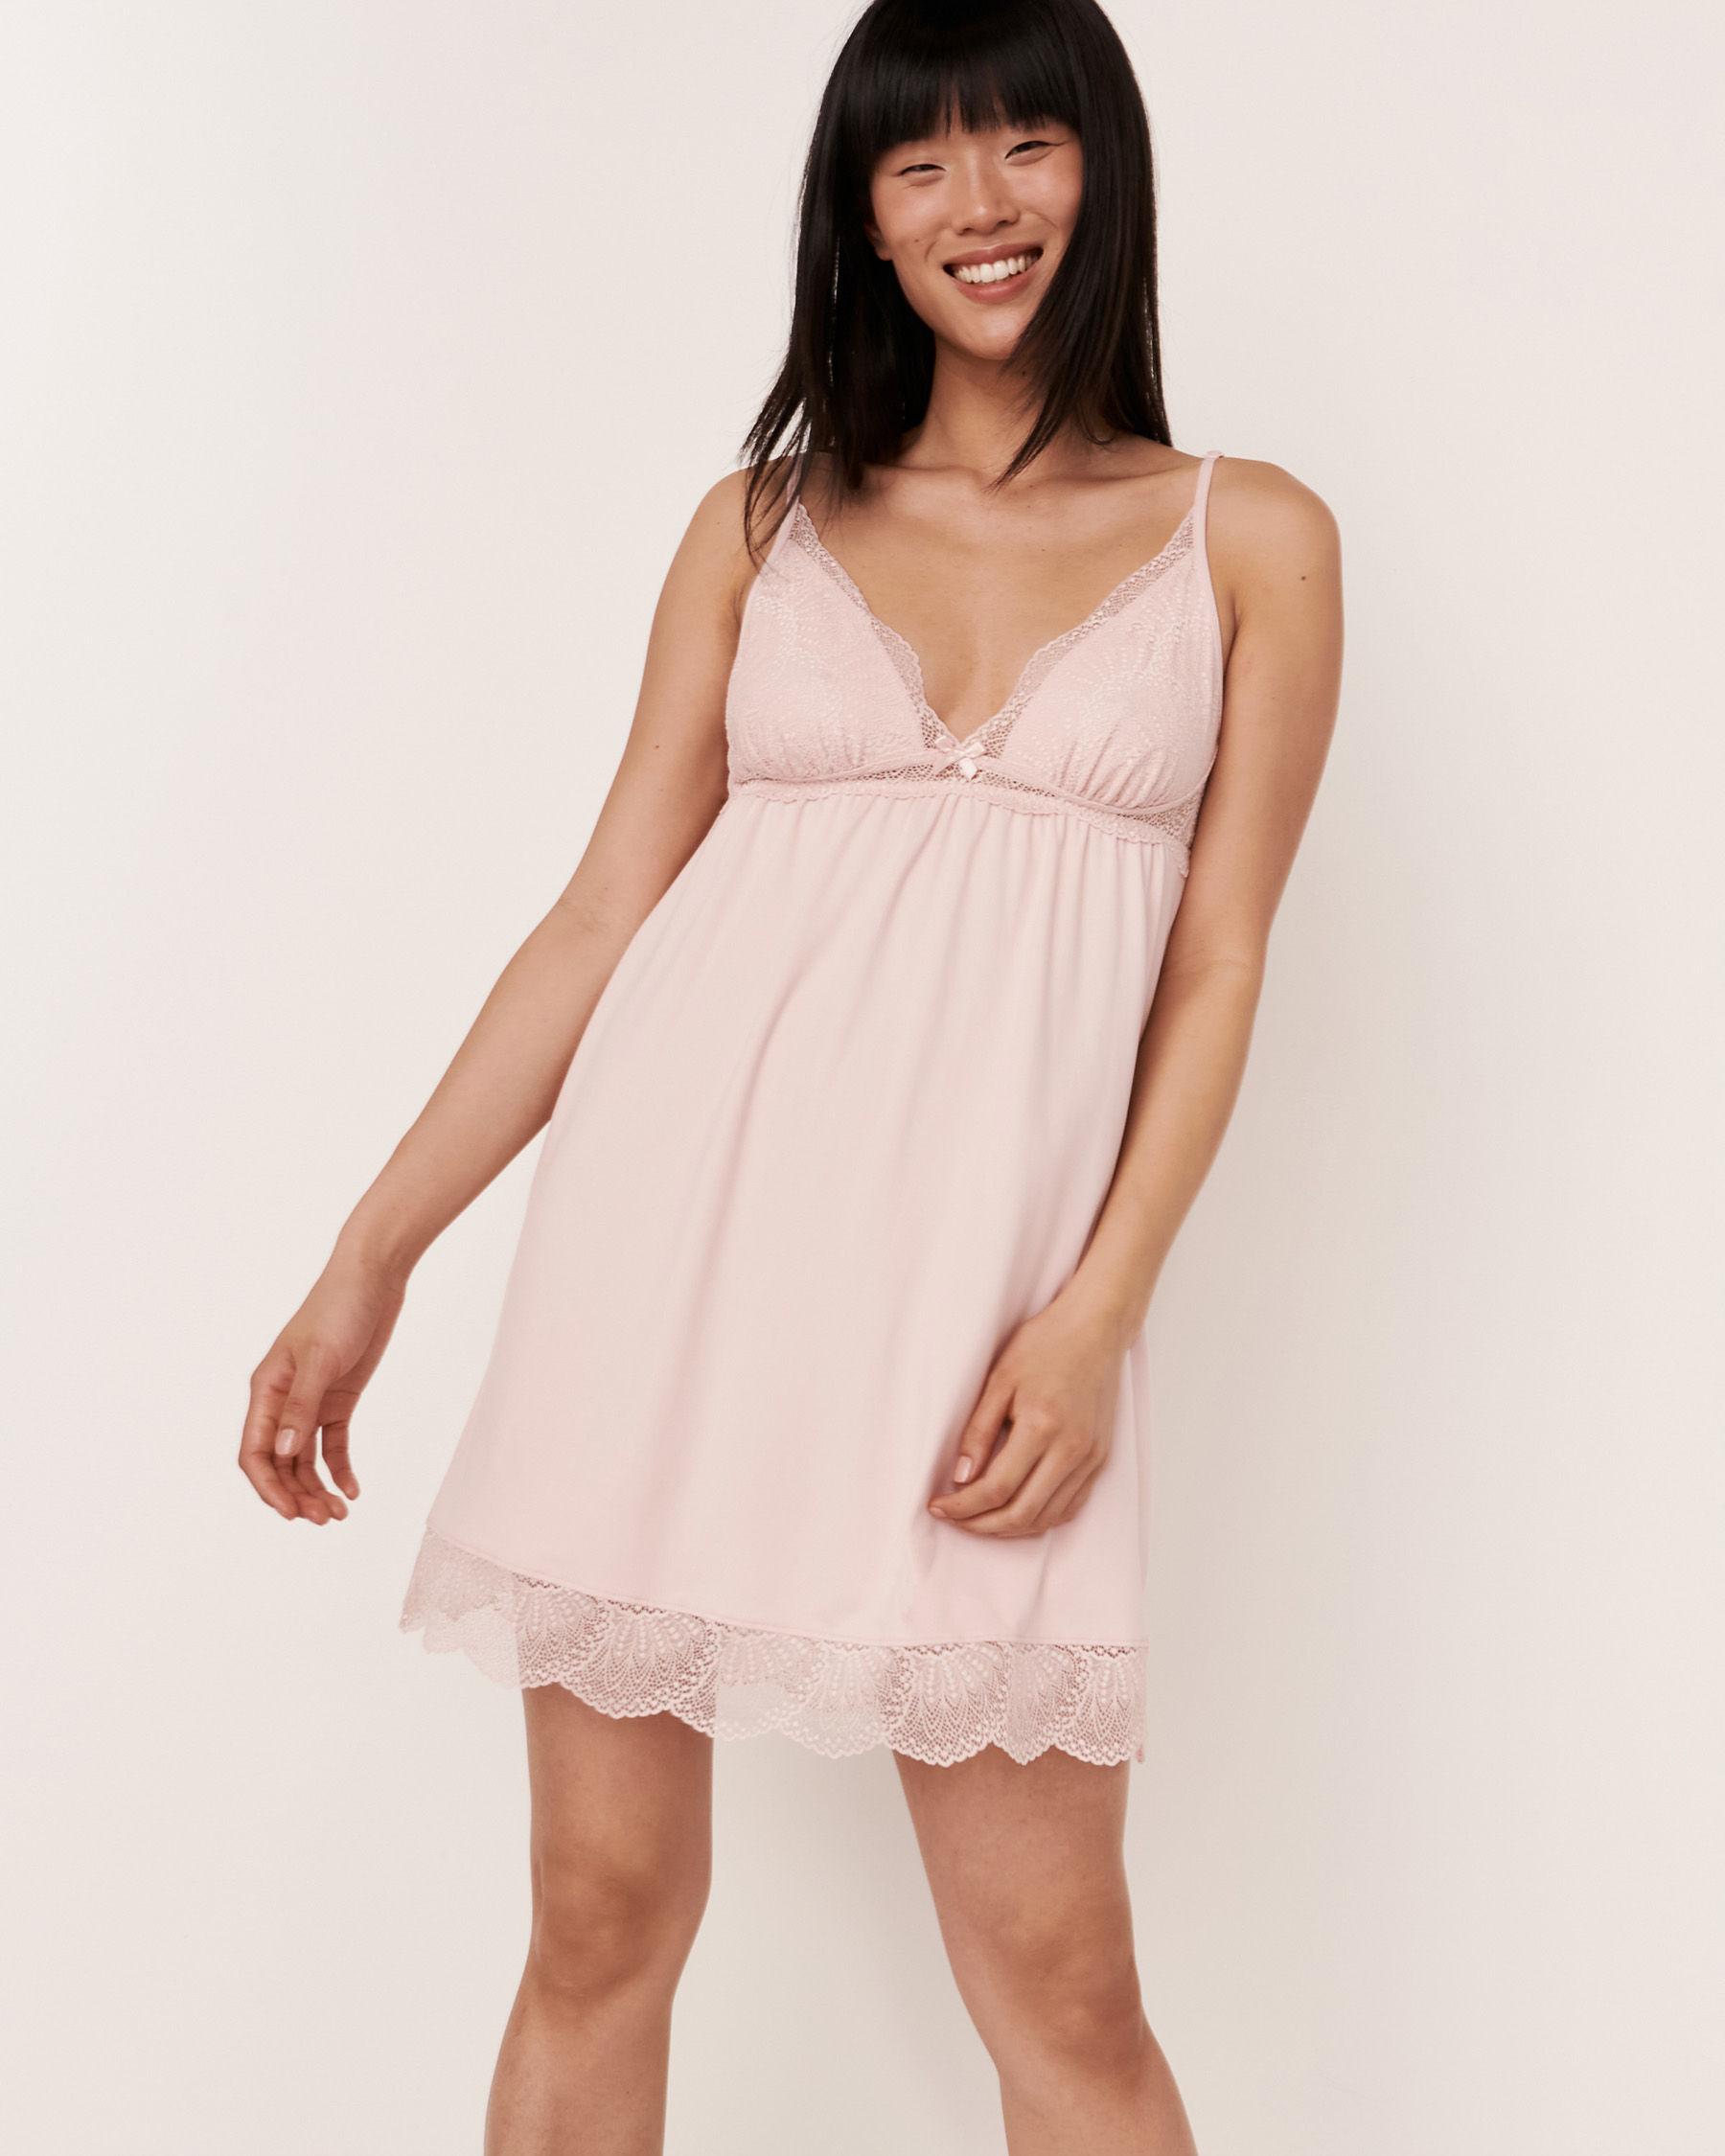 LA VIE EN ROSE Lace Trim Thin Straps Nightie Light pink 40500060 - View1